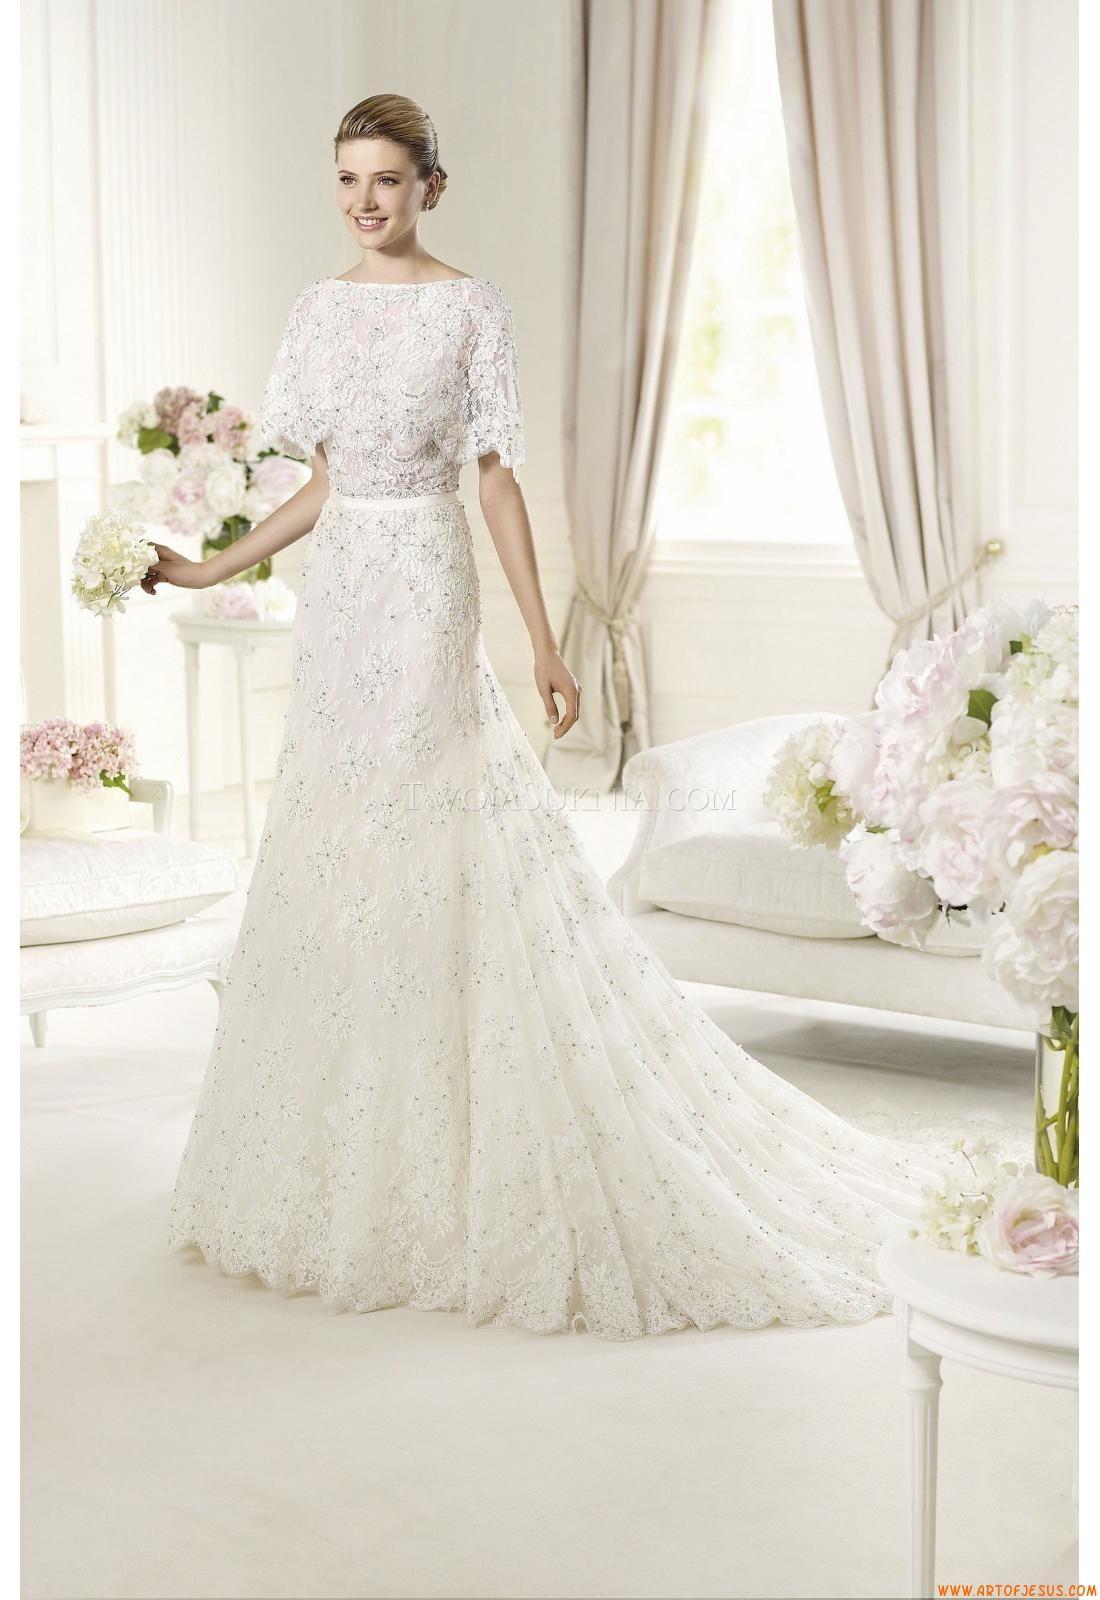 c90353890af0 Свадебные платья Pronovias Magots Elie by Elie Saab 2014 | wedding ...